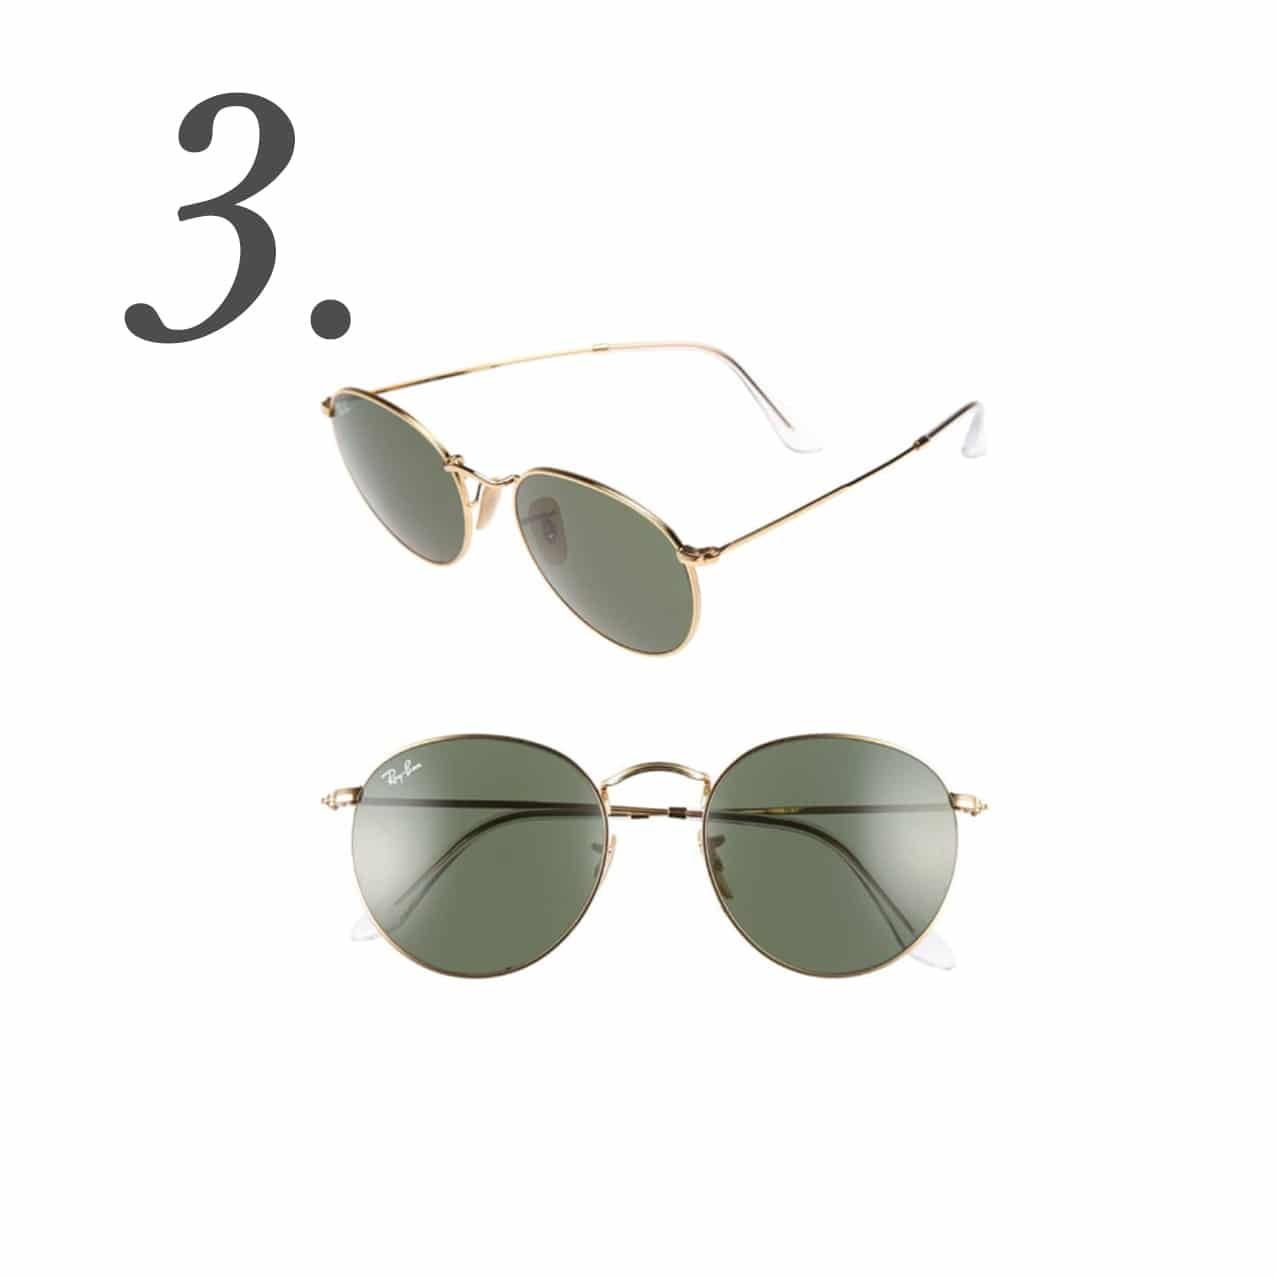 Ray-Ban Icons 53mm Retro Sunglasses | www.ashleybrookedesigns.com